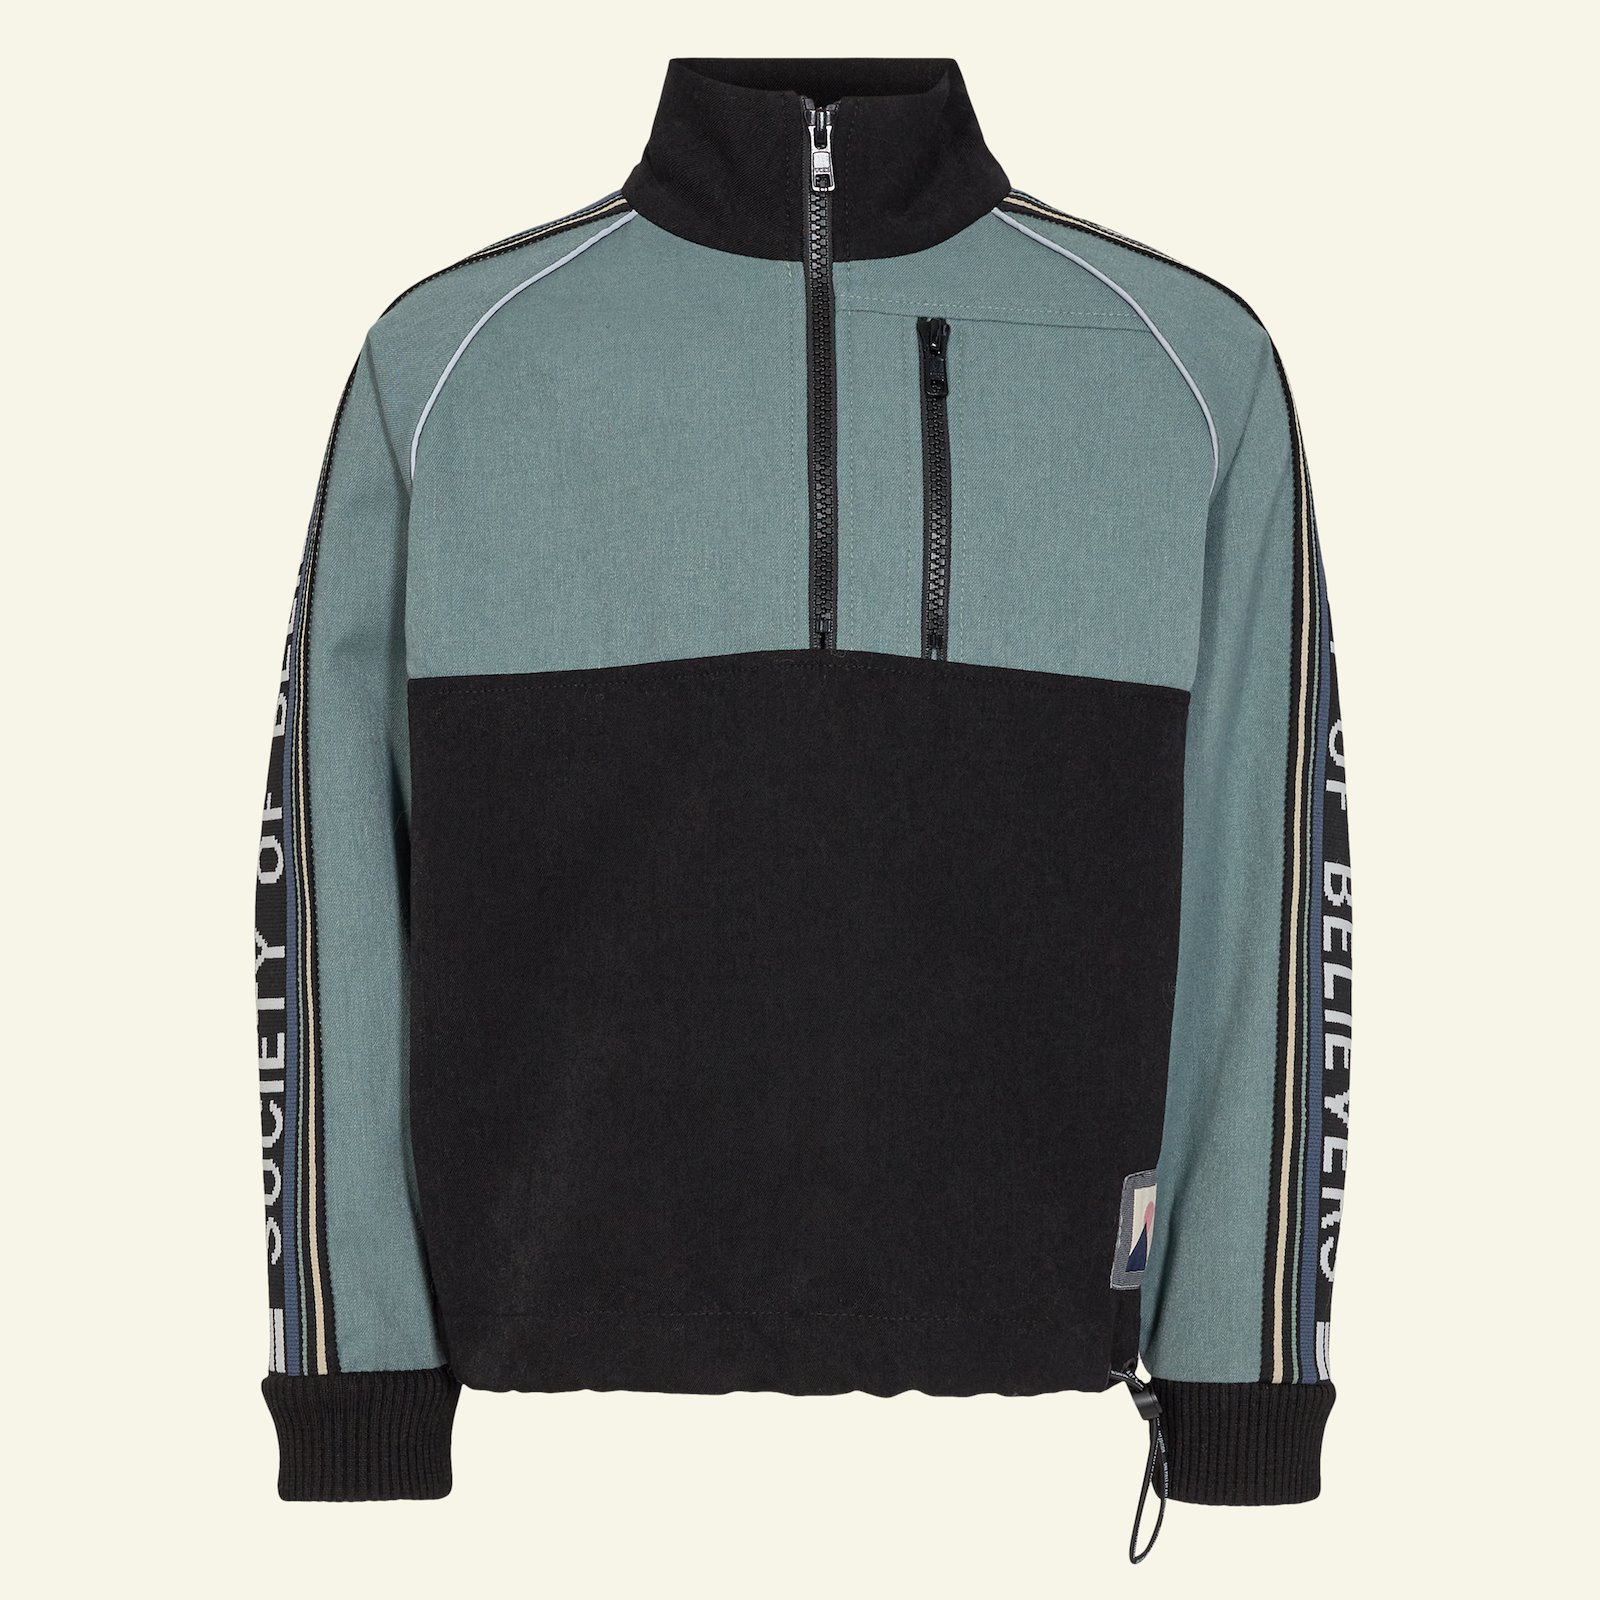 Anorak and jacket, 122/7y p64020_650744_650746_272436_96077_3509089_72091_sskit